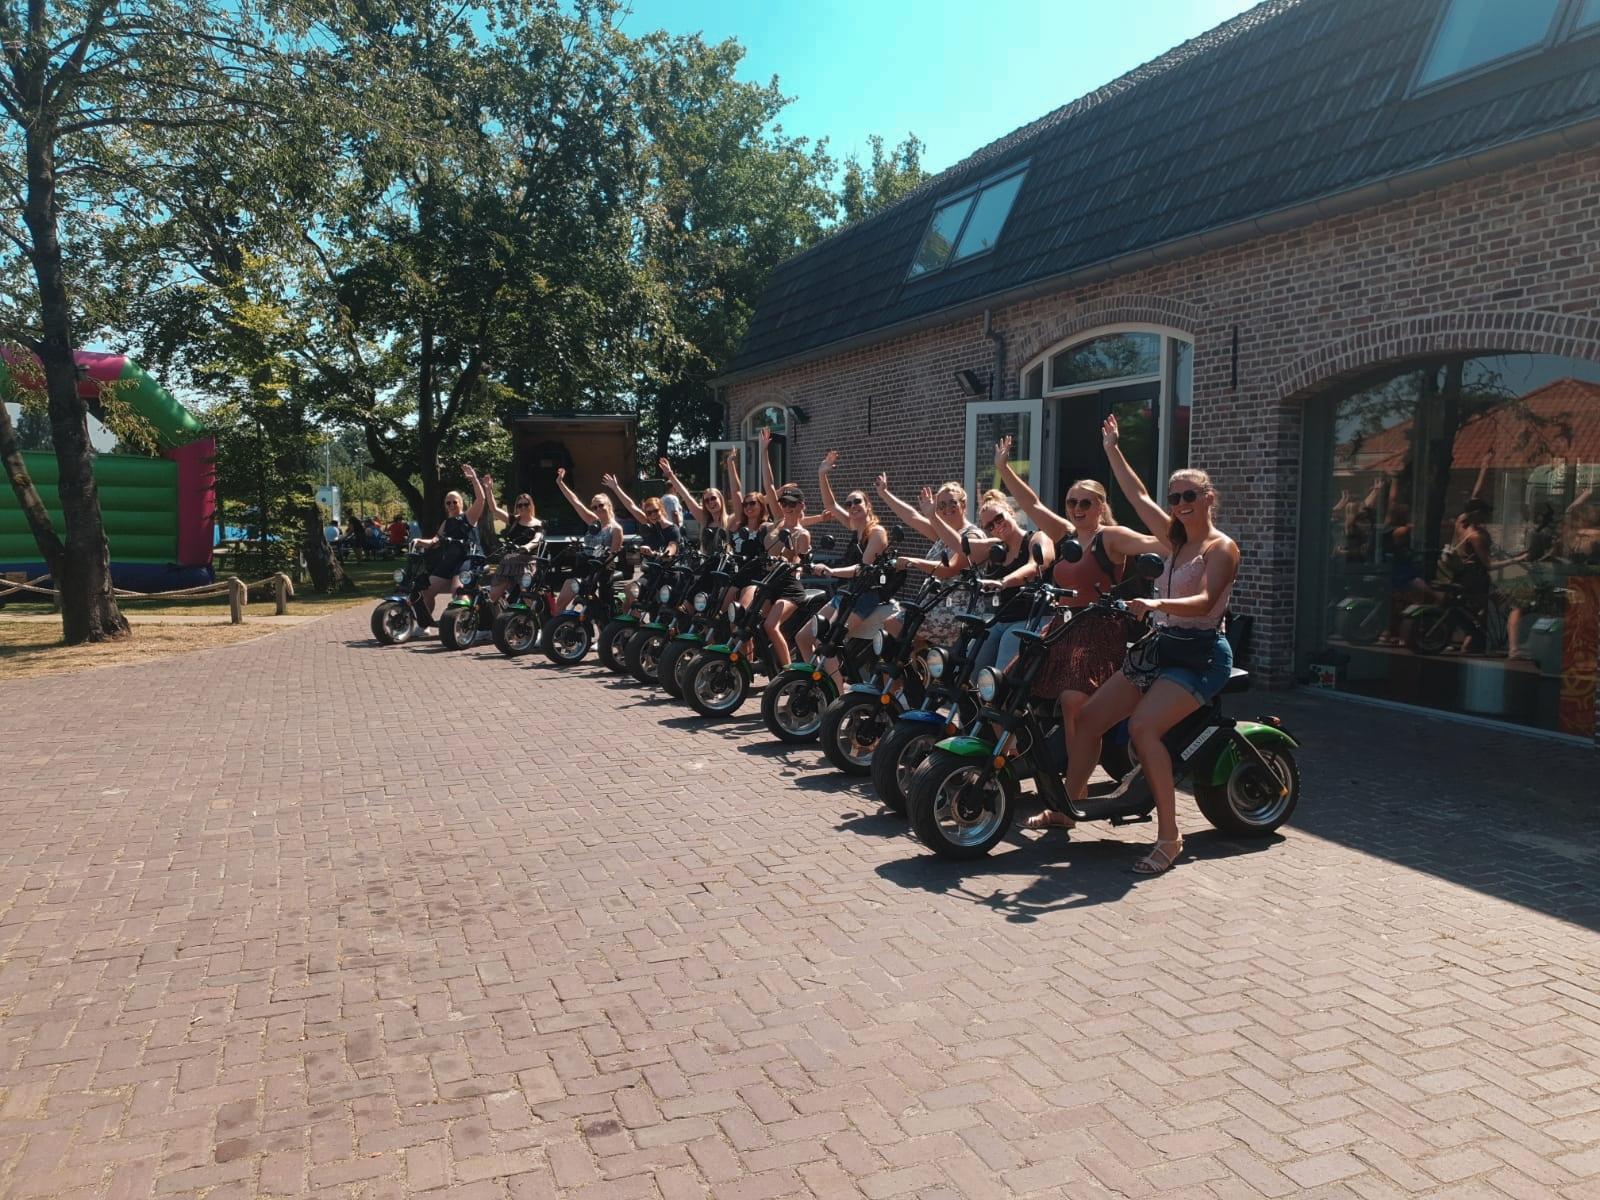 Bedrijfsuitje met e-chopper of e-scooter tour